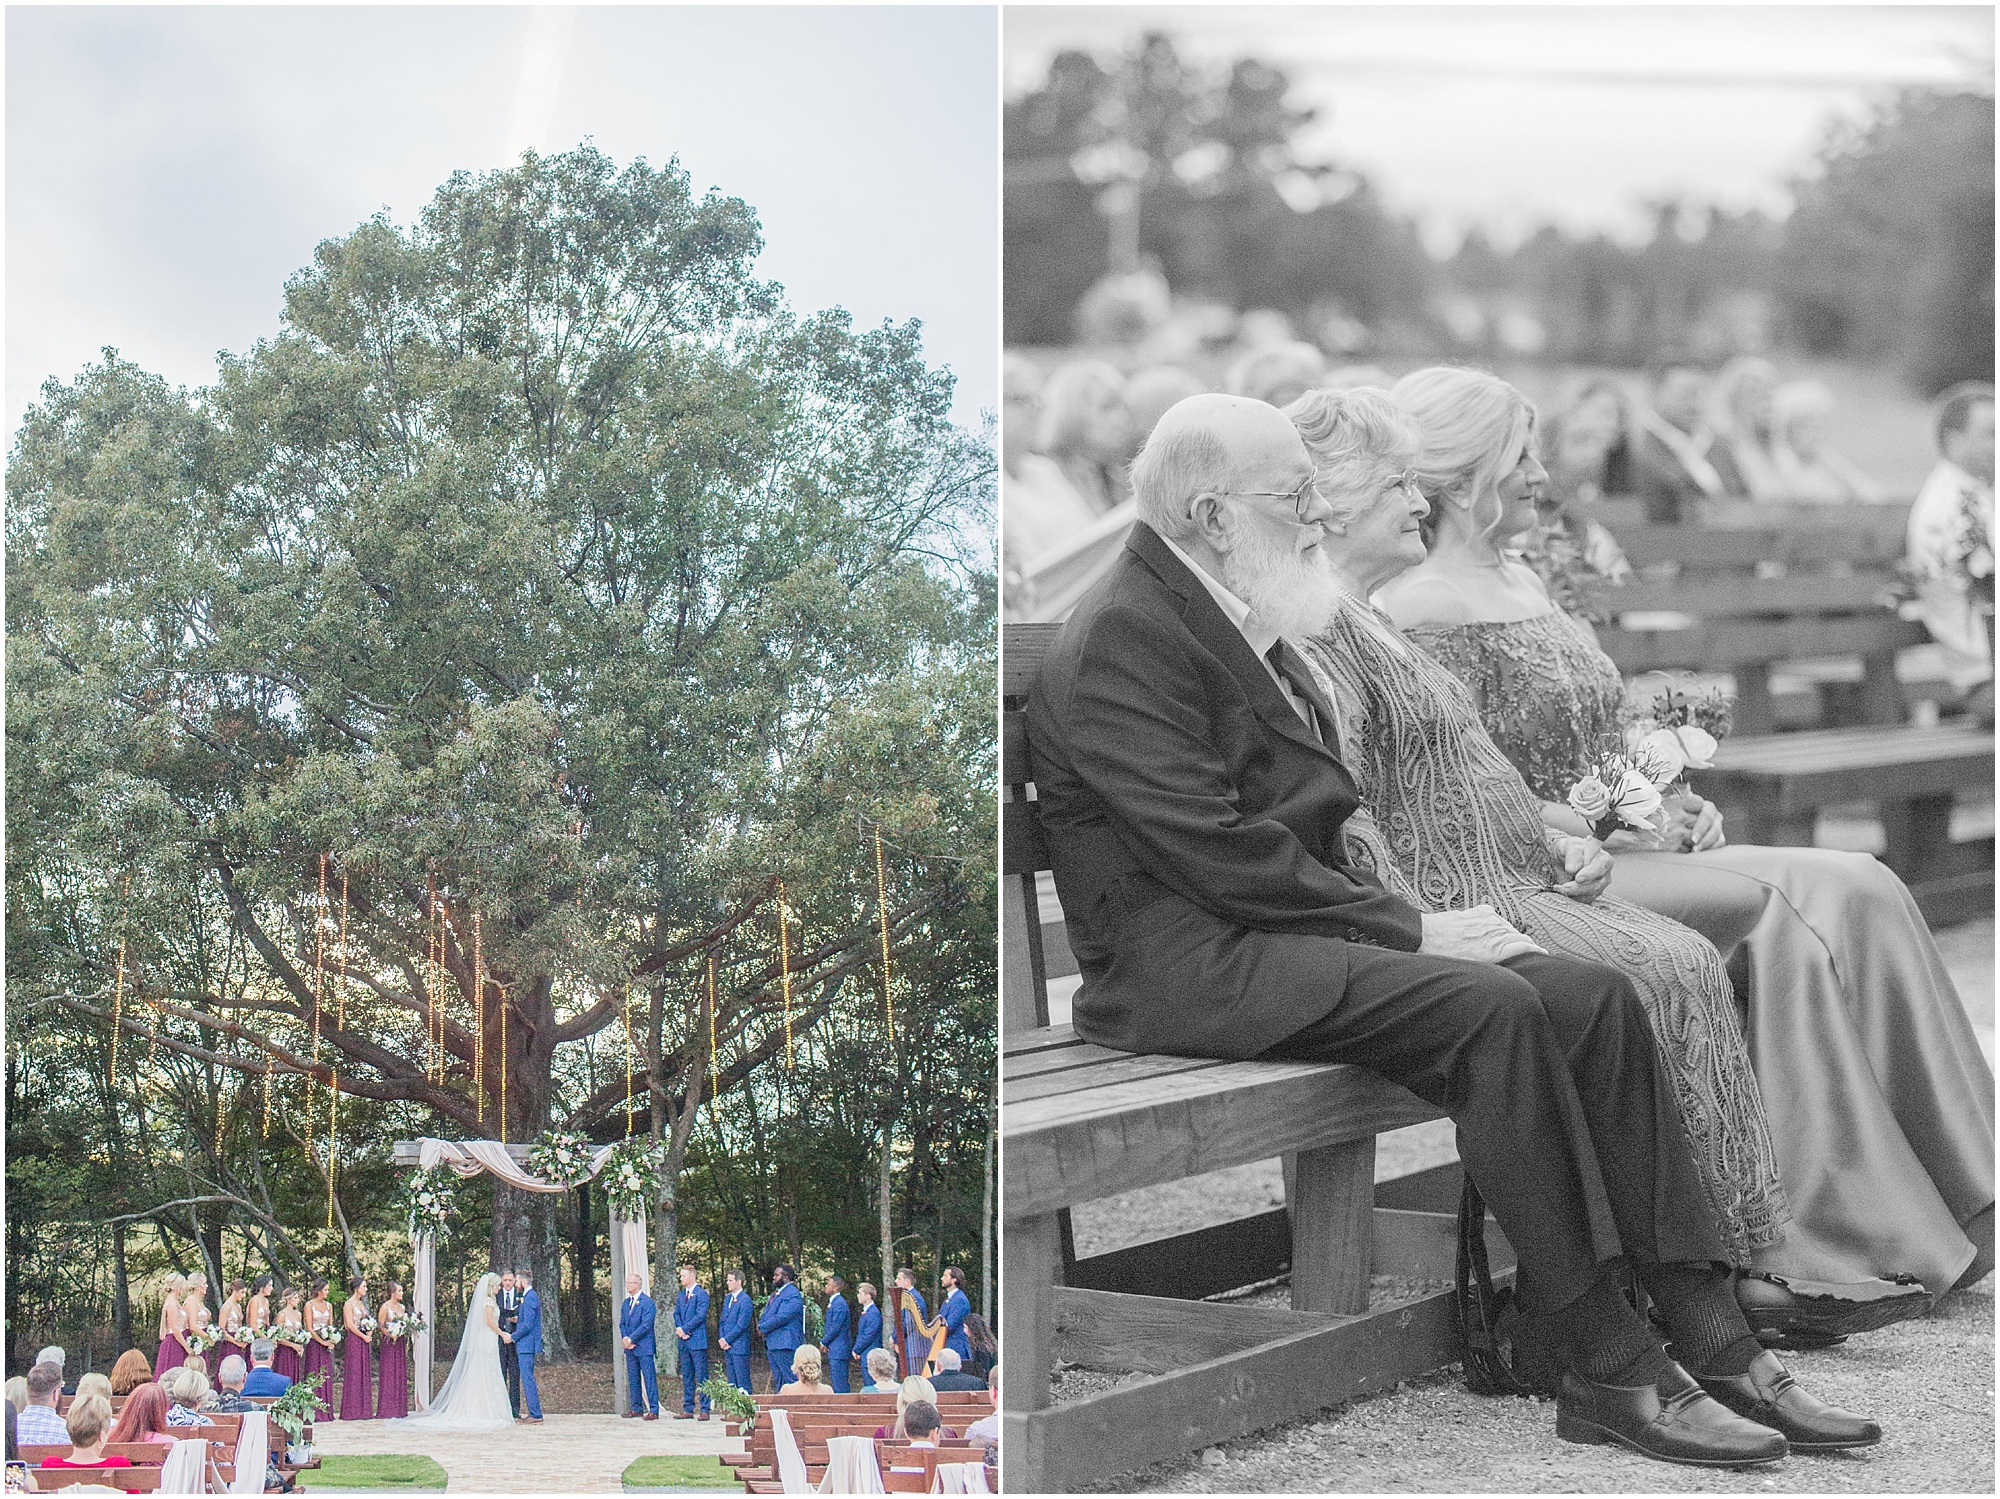 fall-wedding-bridlewood-of-madison-mississippi_0054.jpg